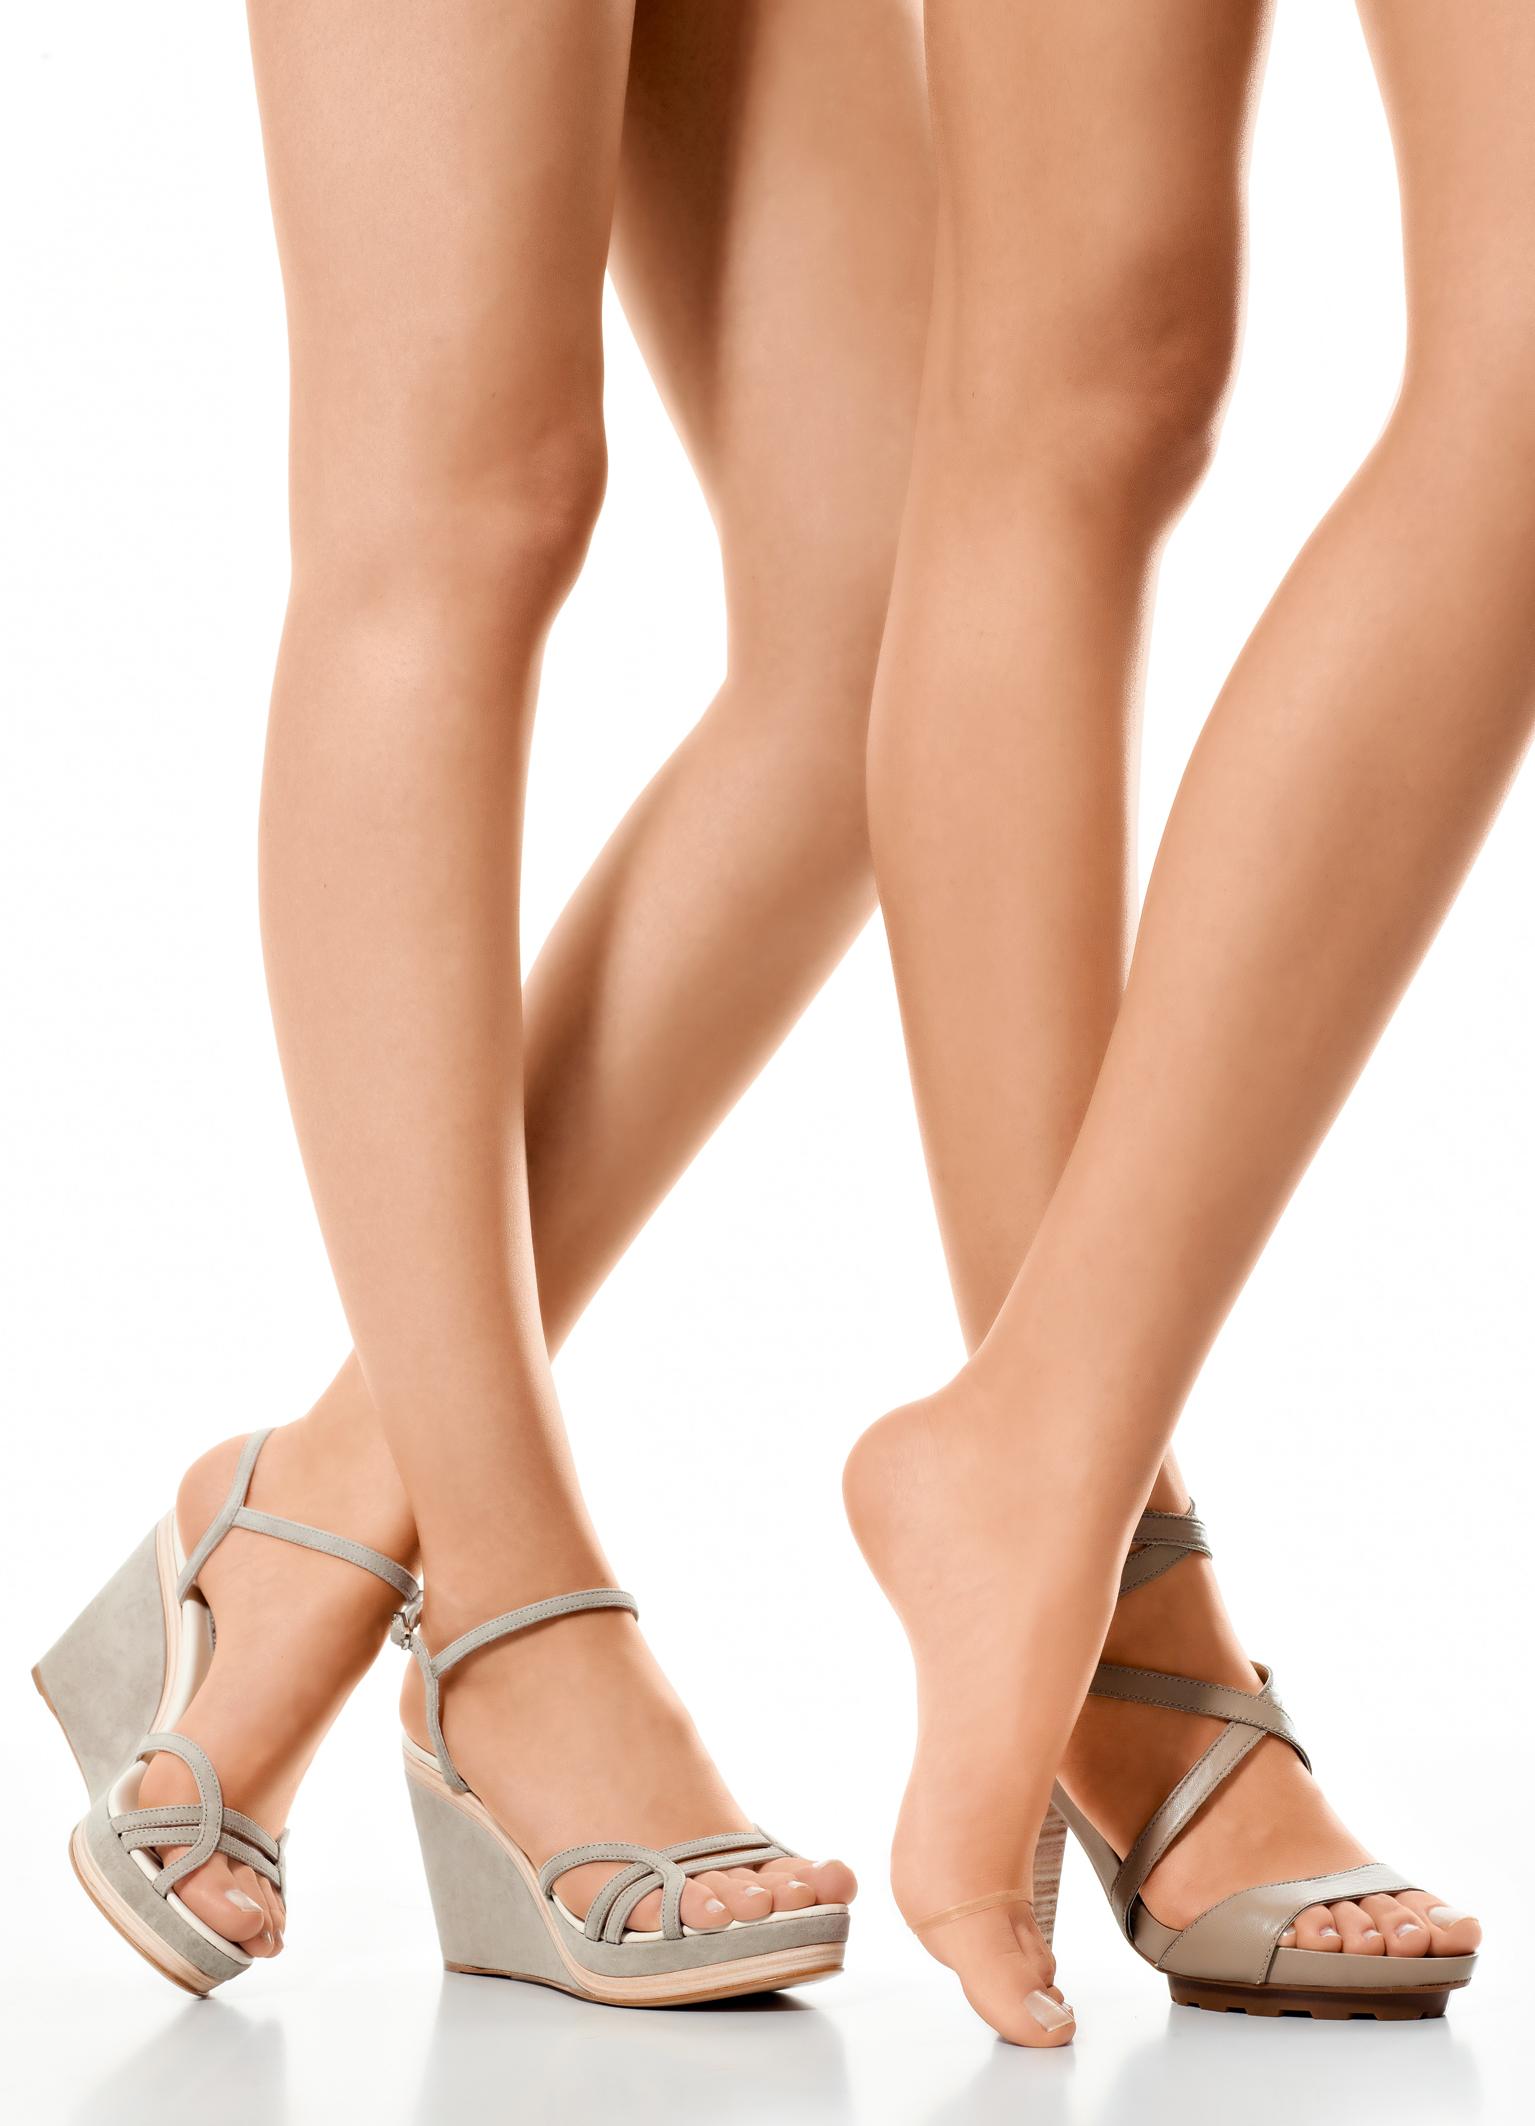 порно пяточки ног